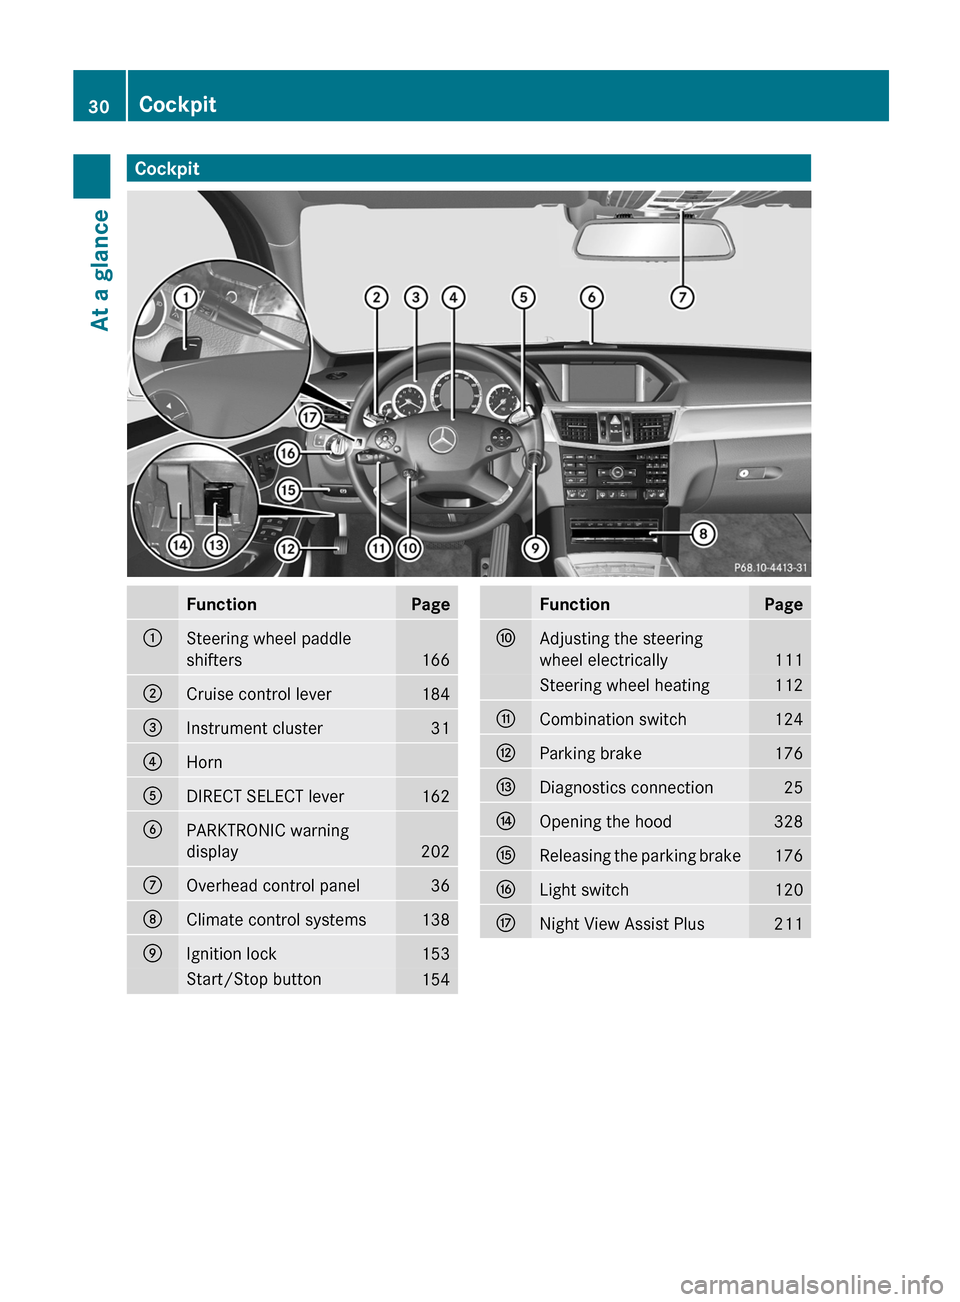 mercedes b class 2013 owners manual pdf